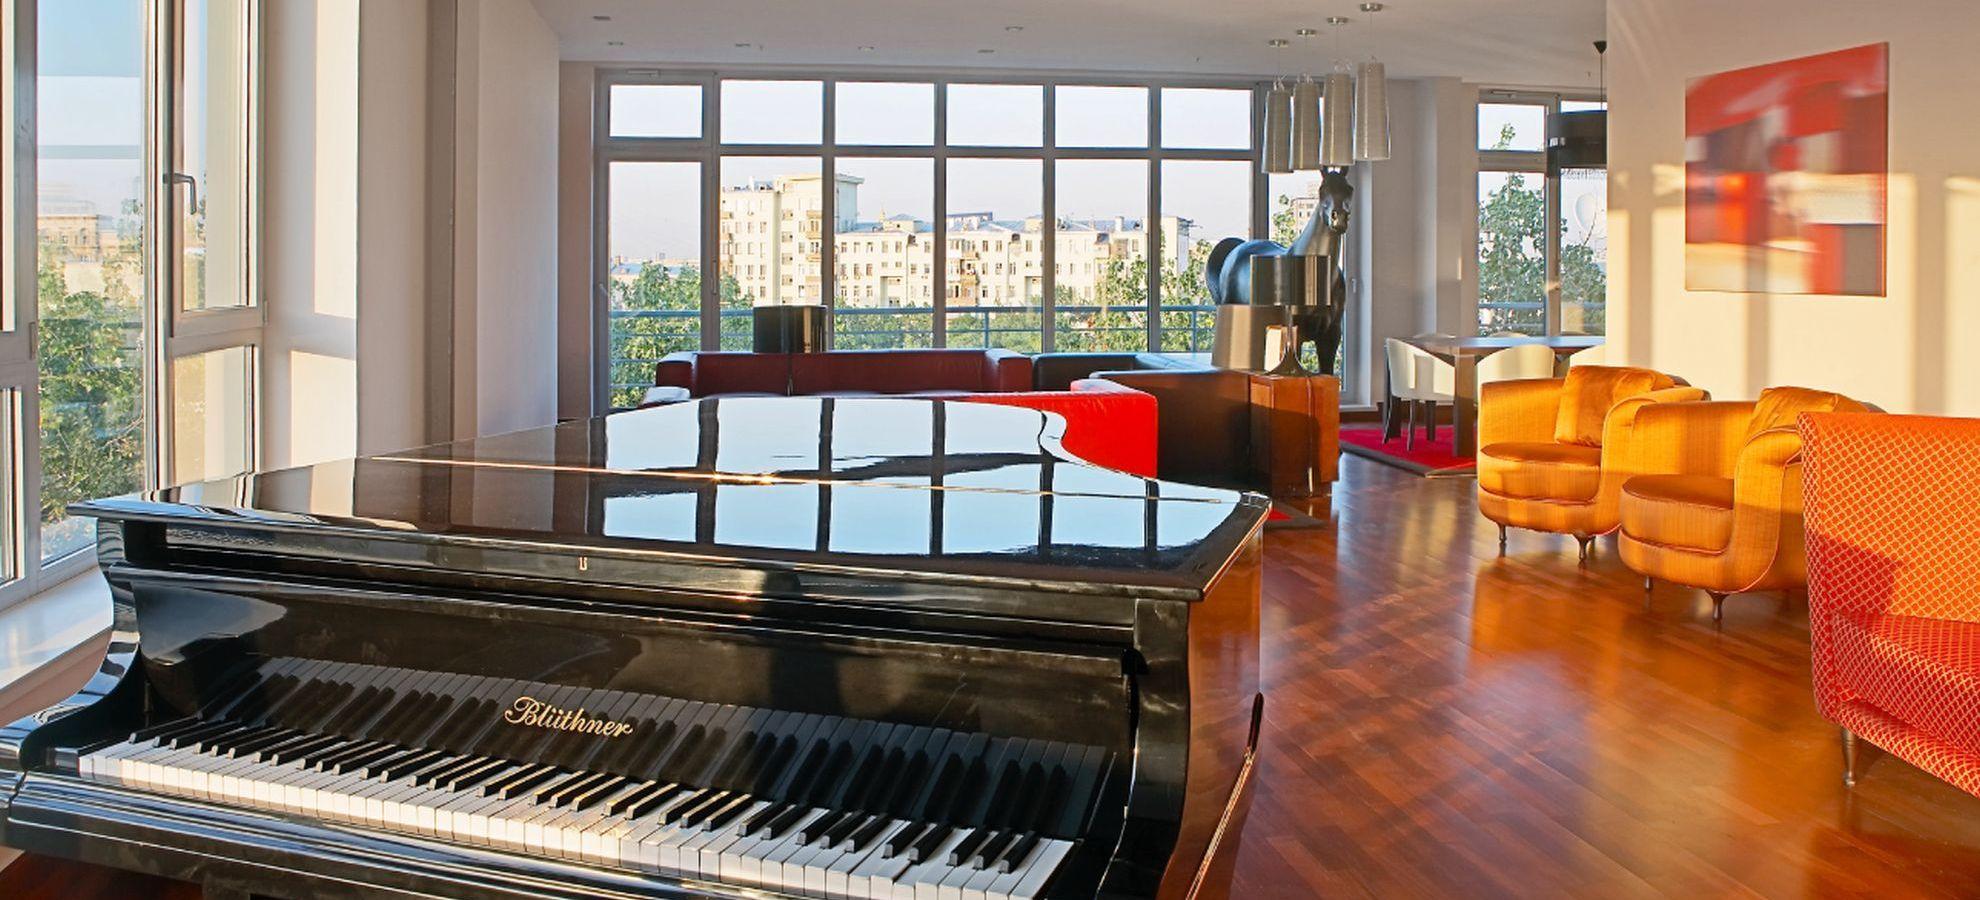 Mamaison-Hotel-Pokrovka-Chairman-Suite-Piano.jpg